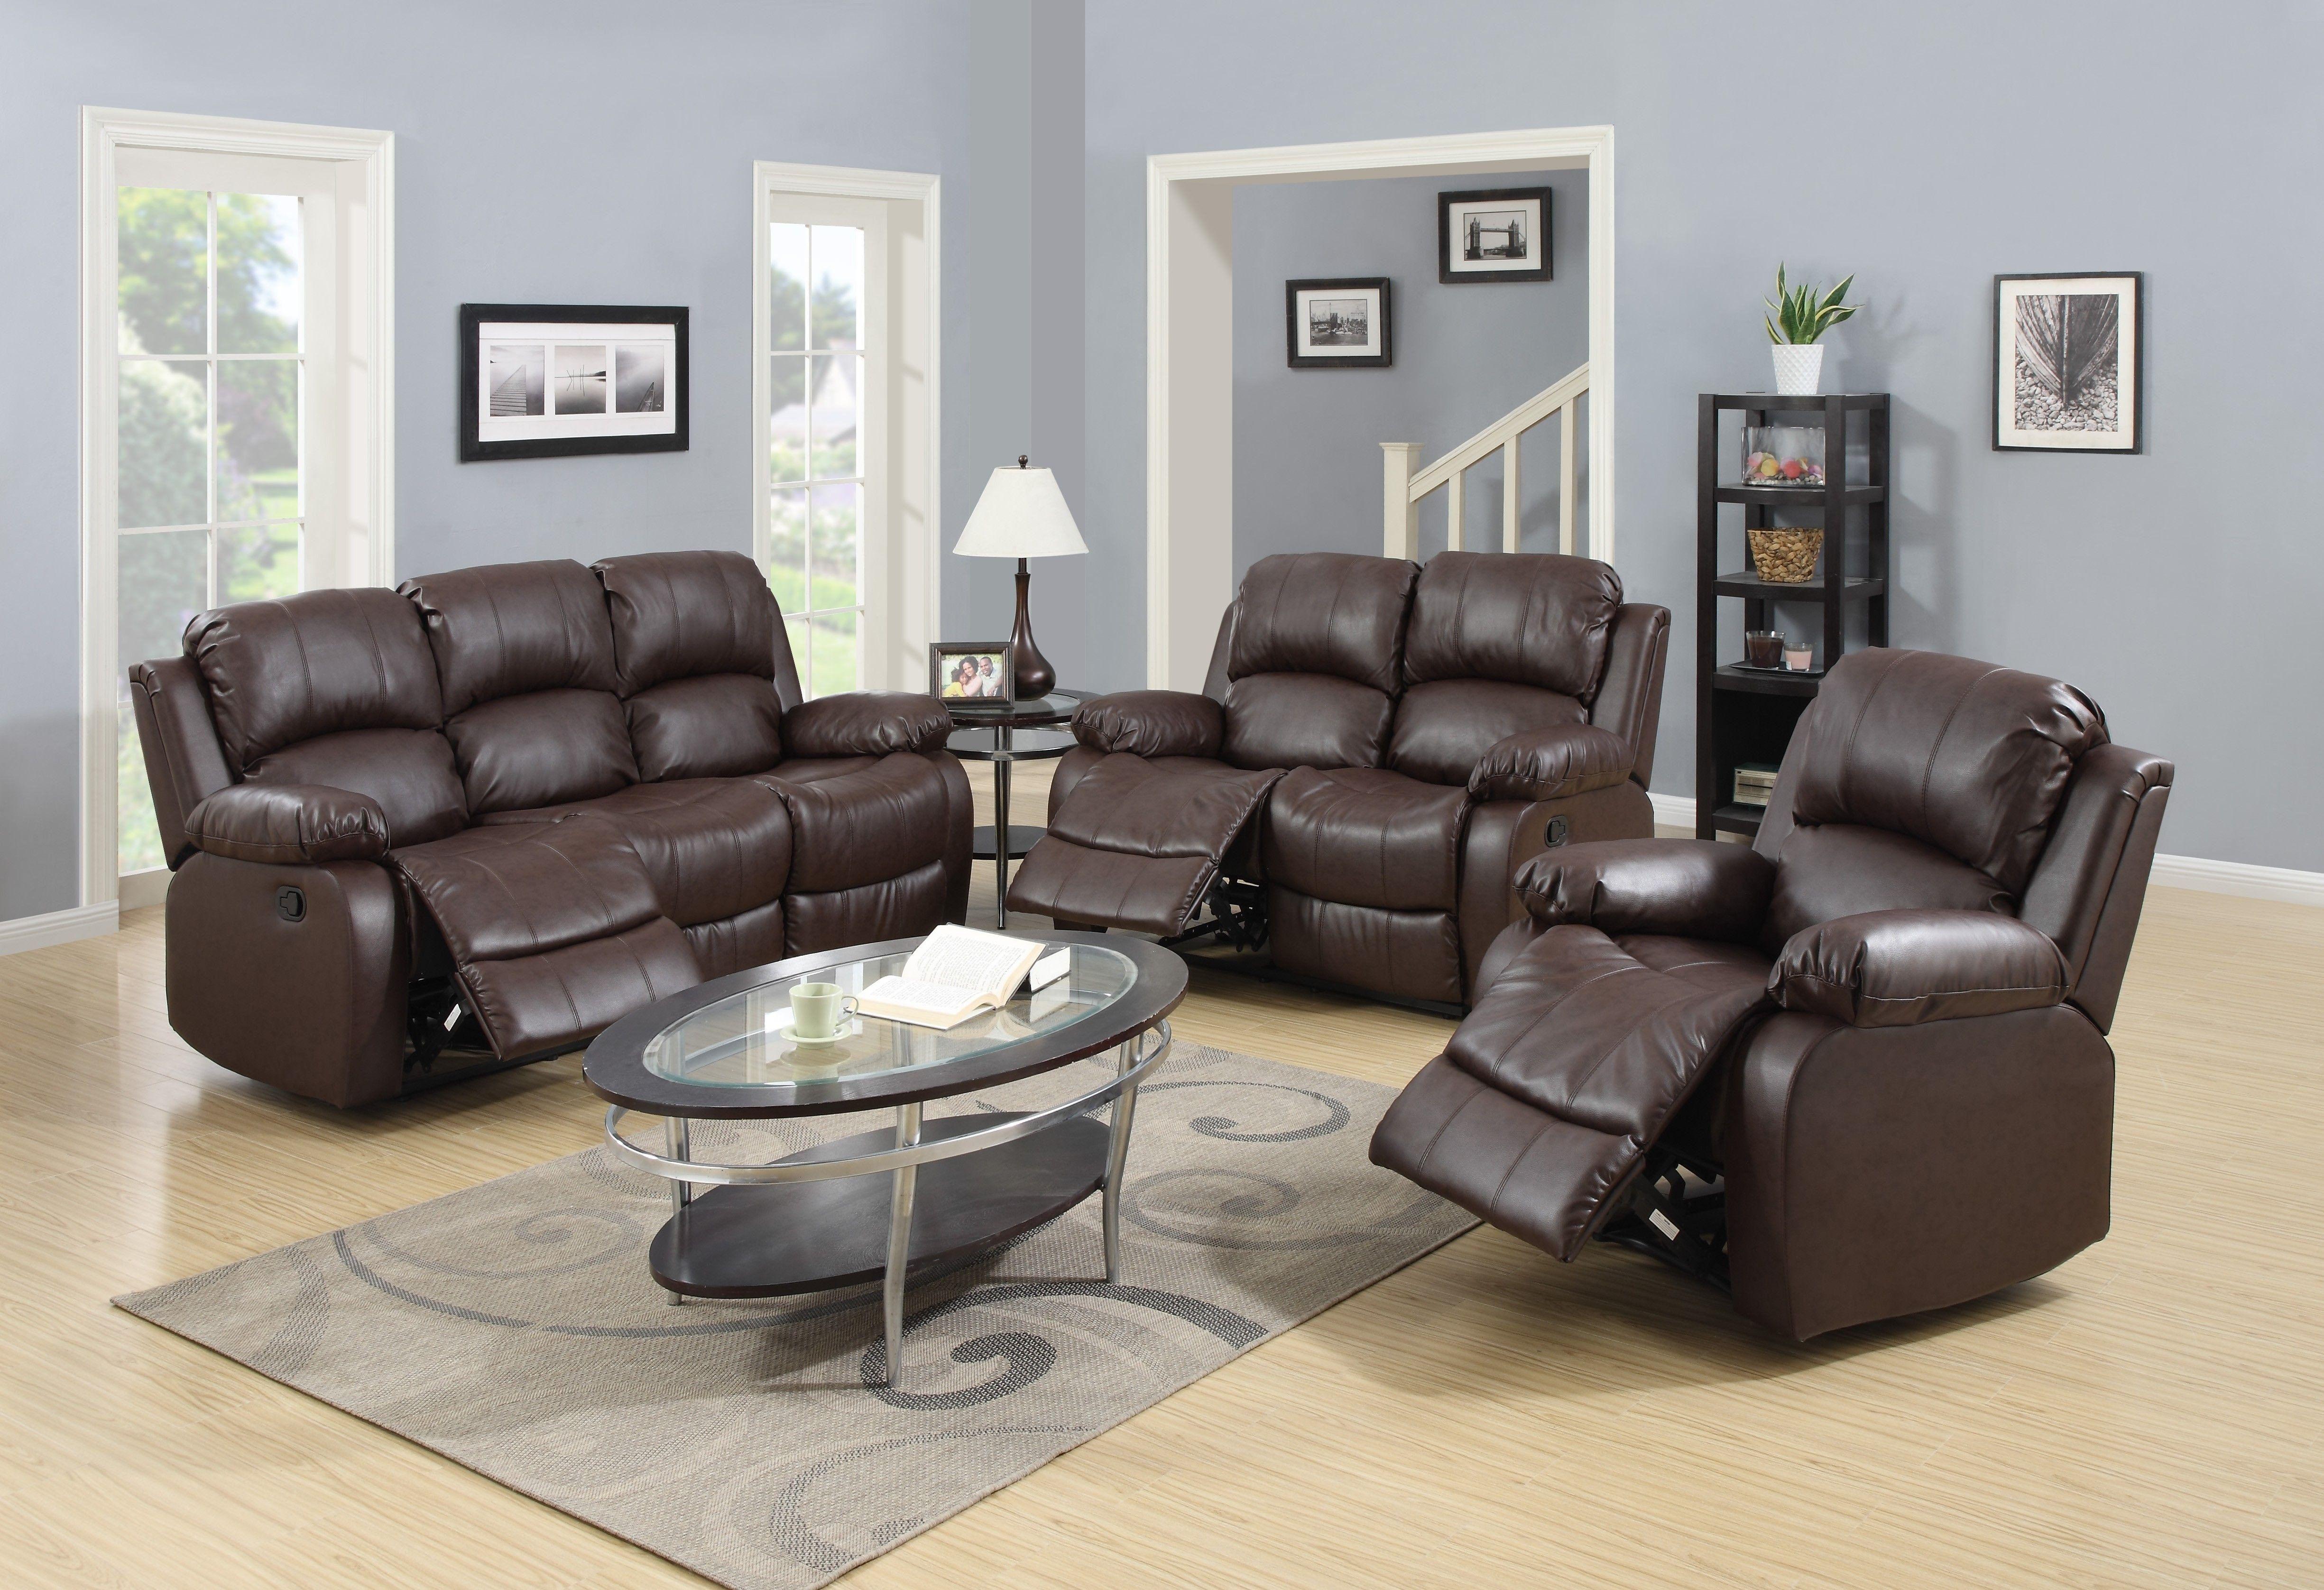 brown leather sofa living room ideas unique chic idea